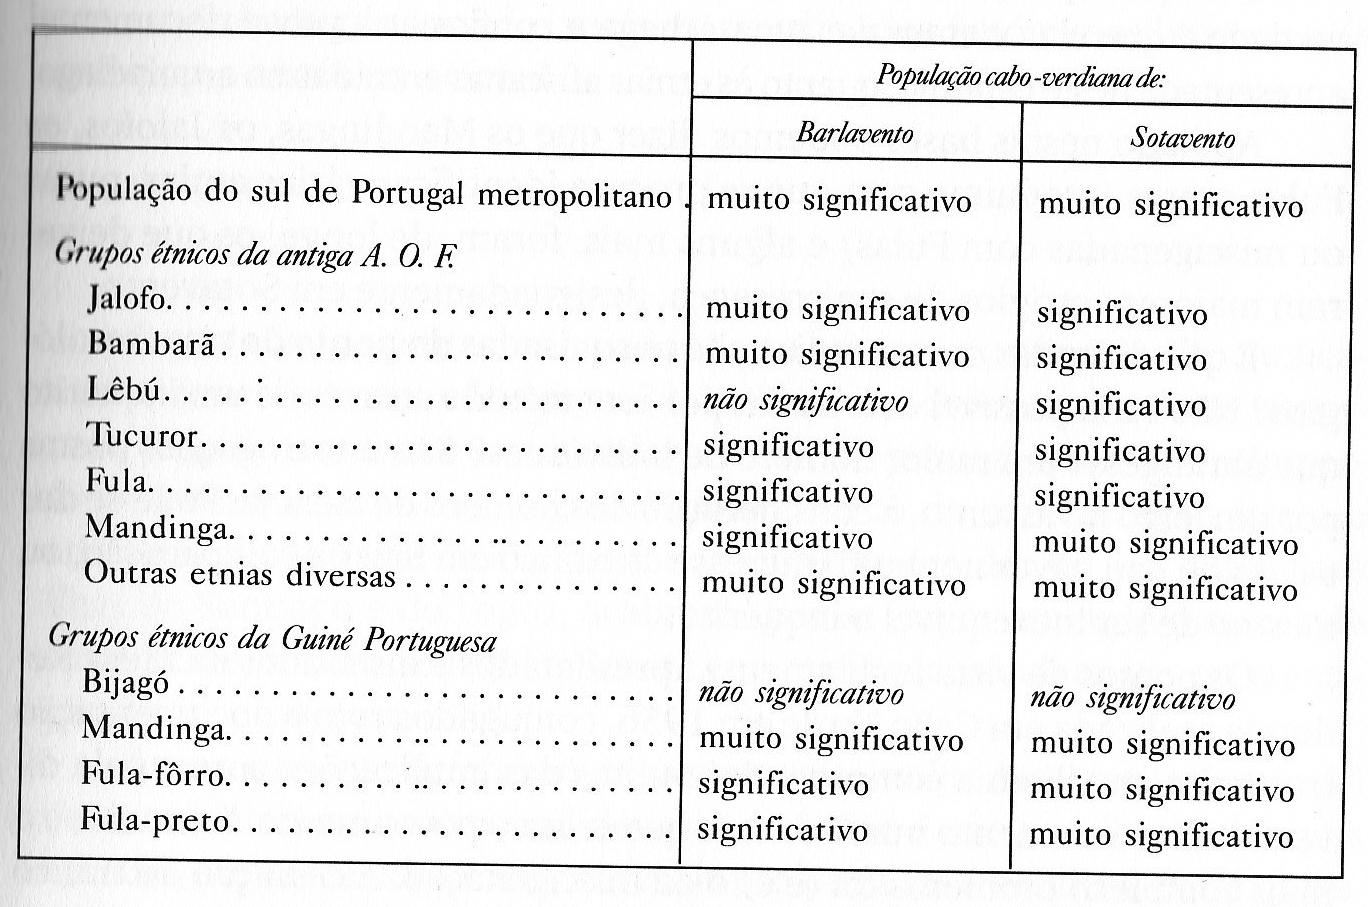 A. Carreira - Bloodgroups